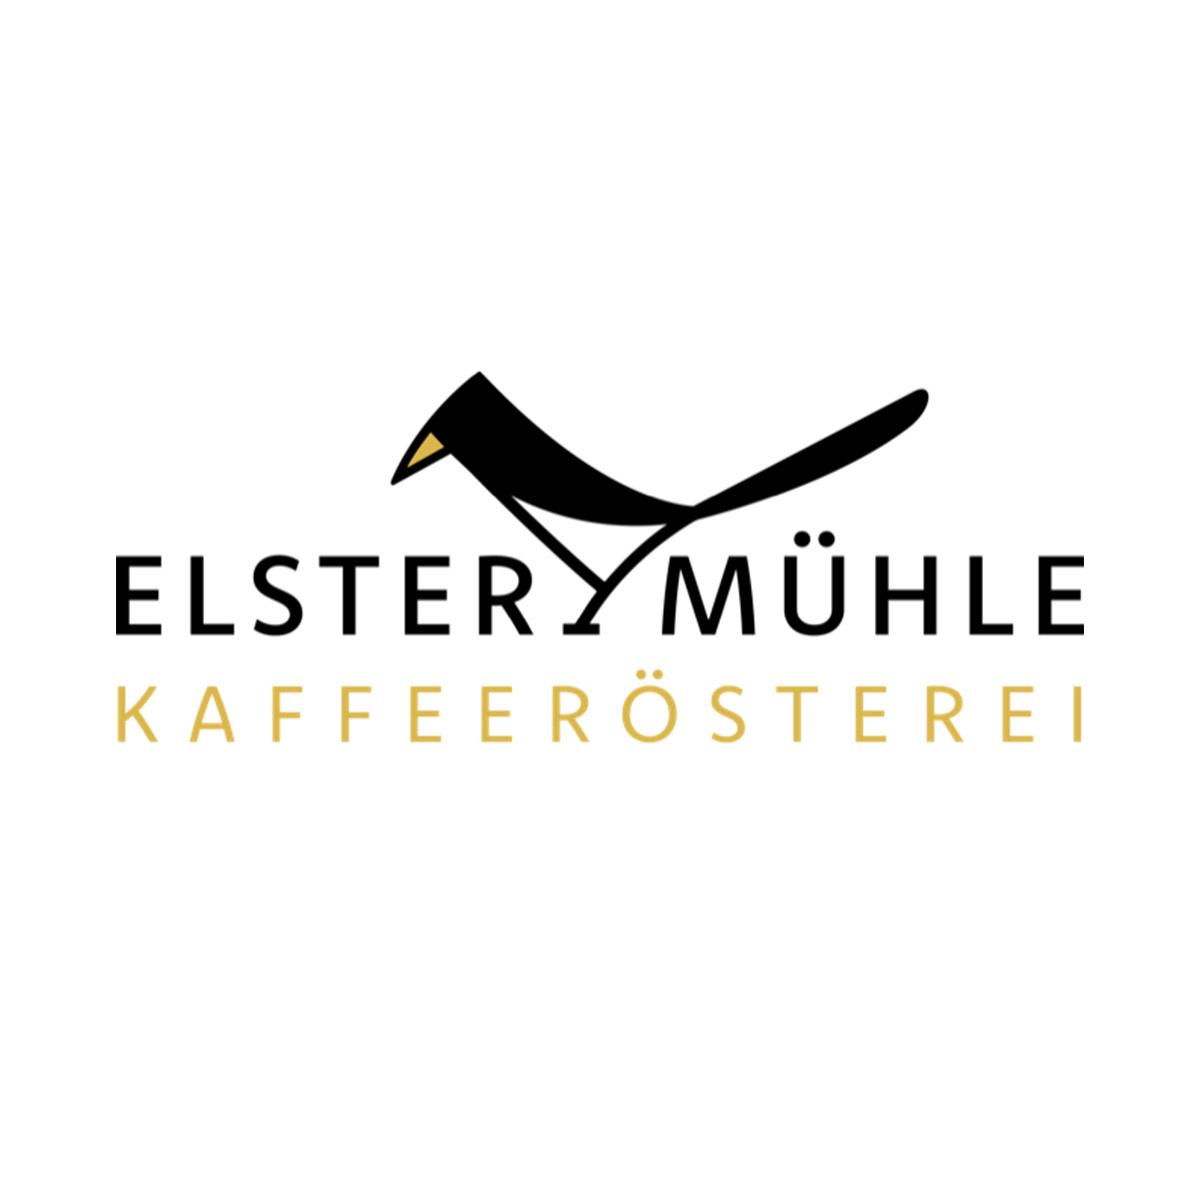 Elstermühle Logo